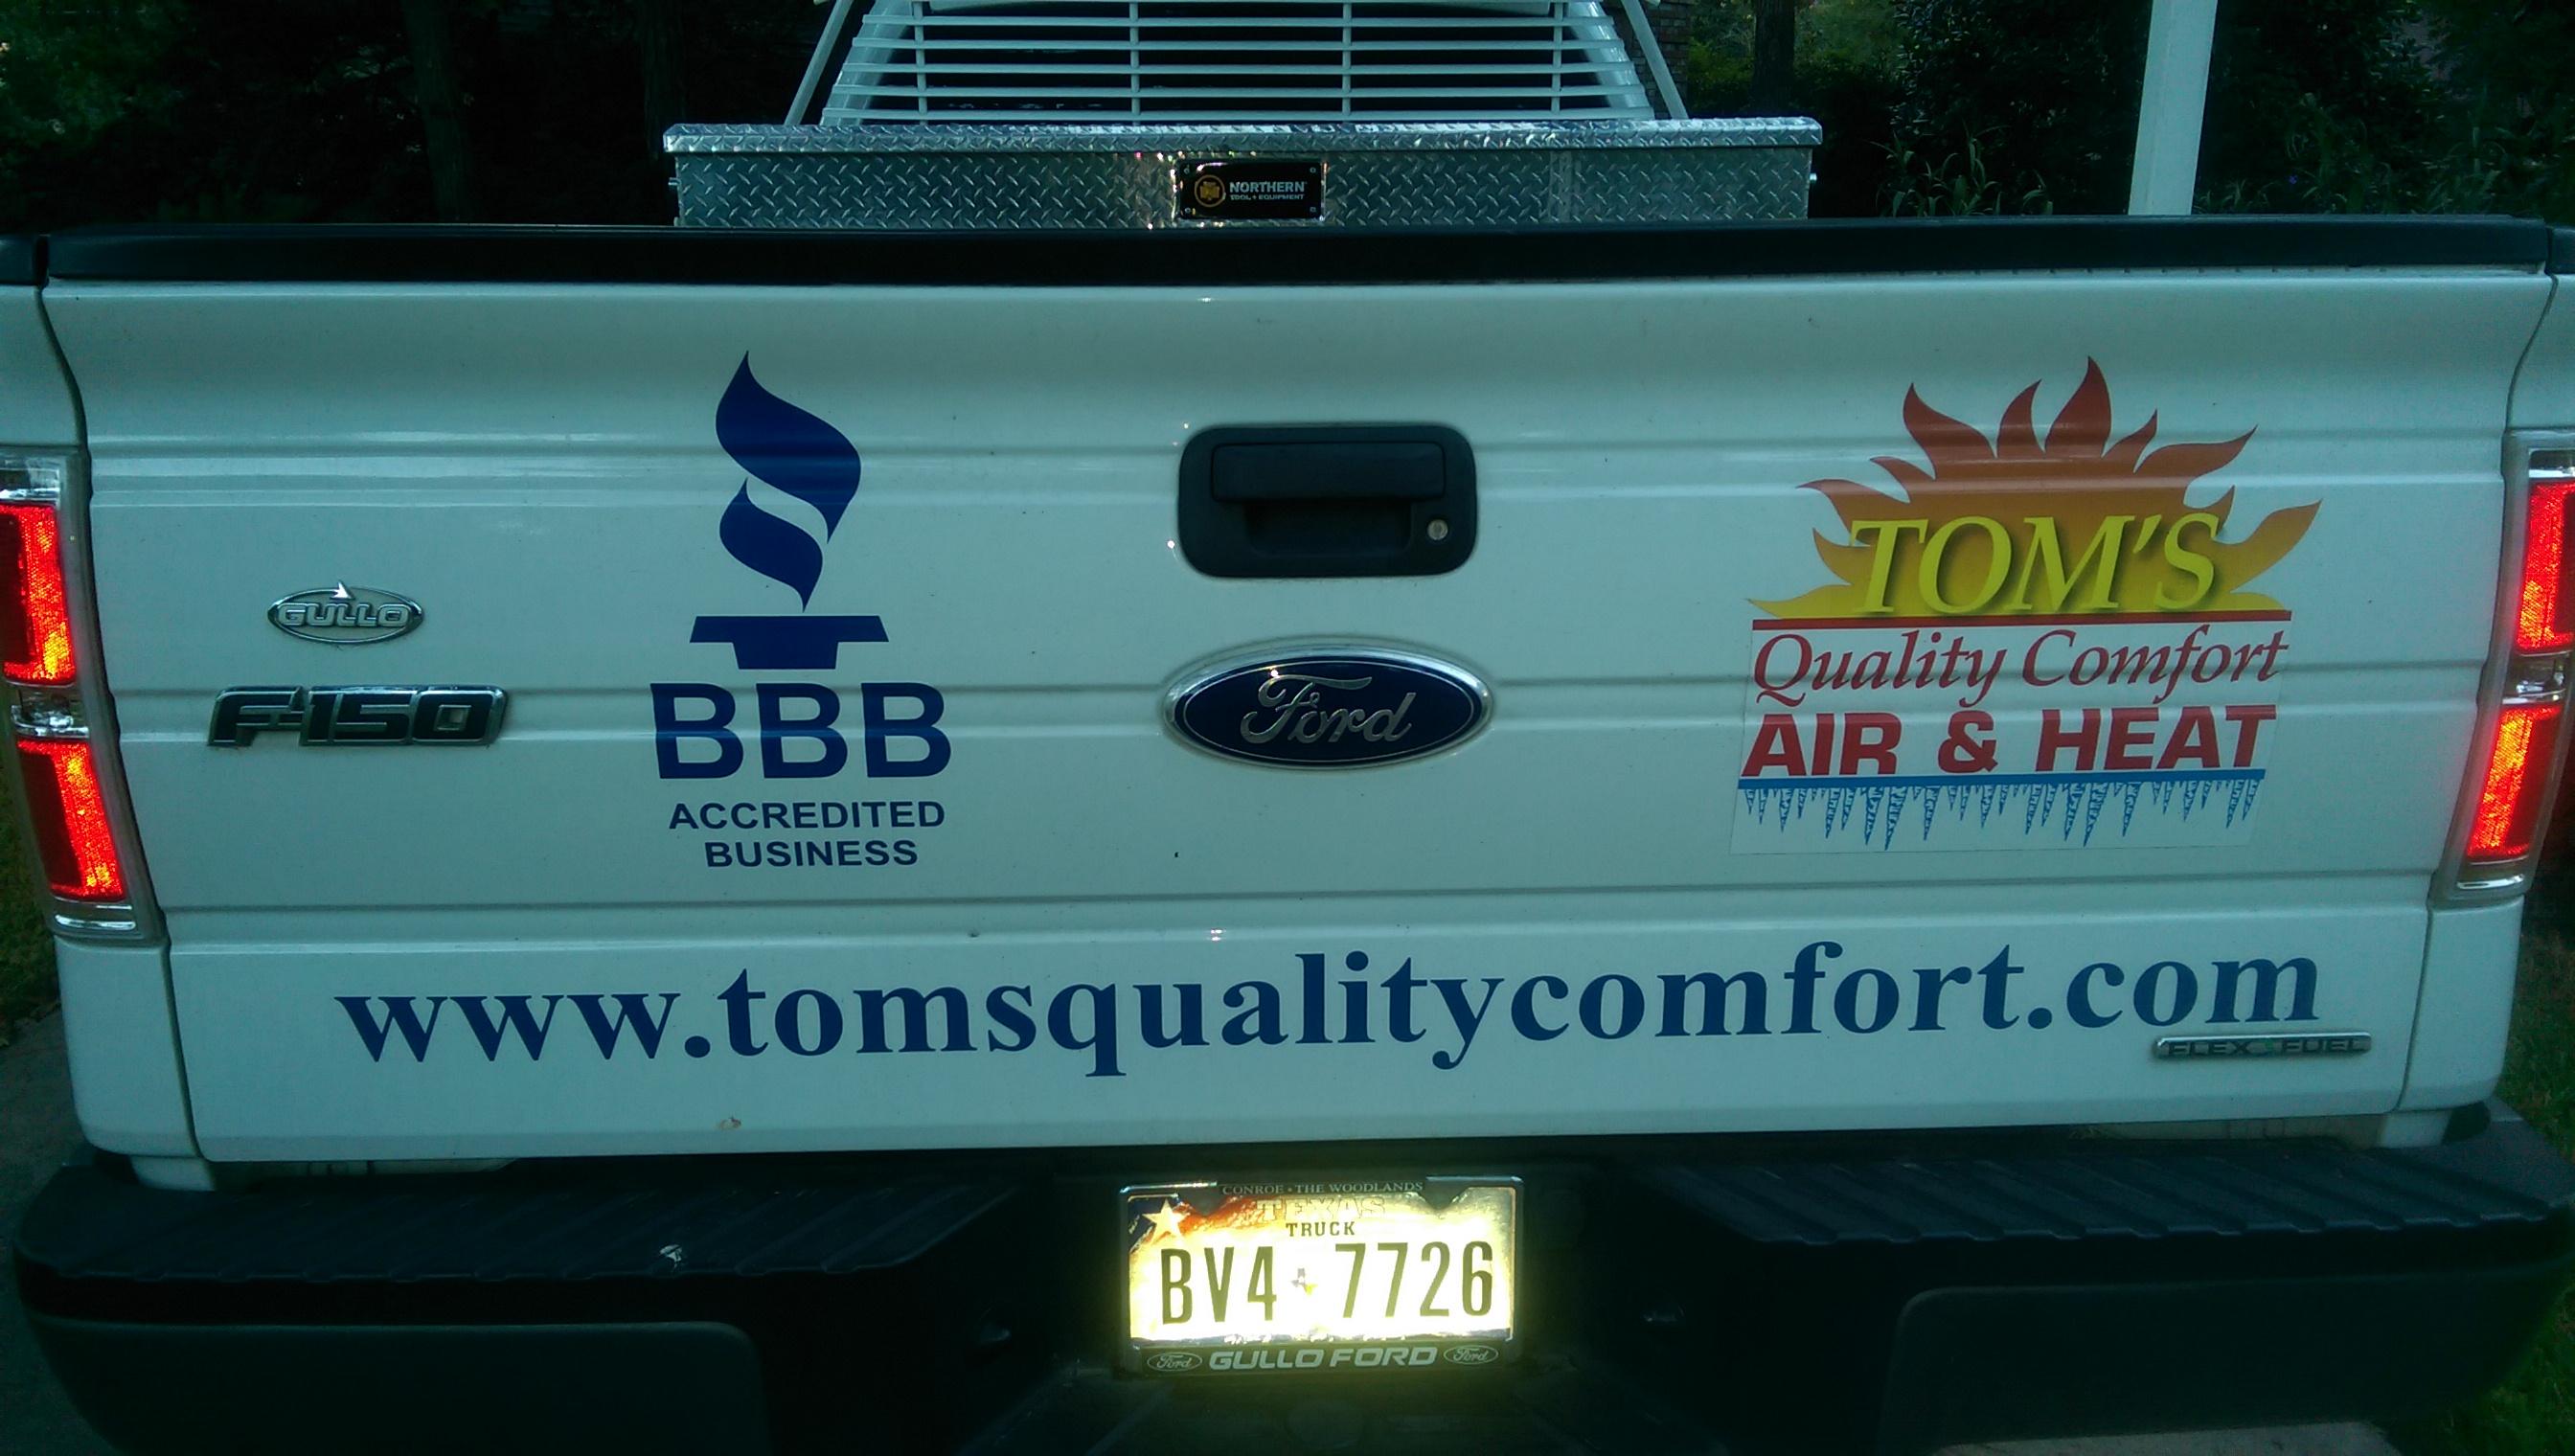 Tom's Quality Comfort Air & Heat image 14